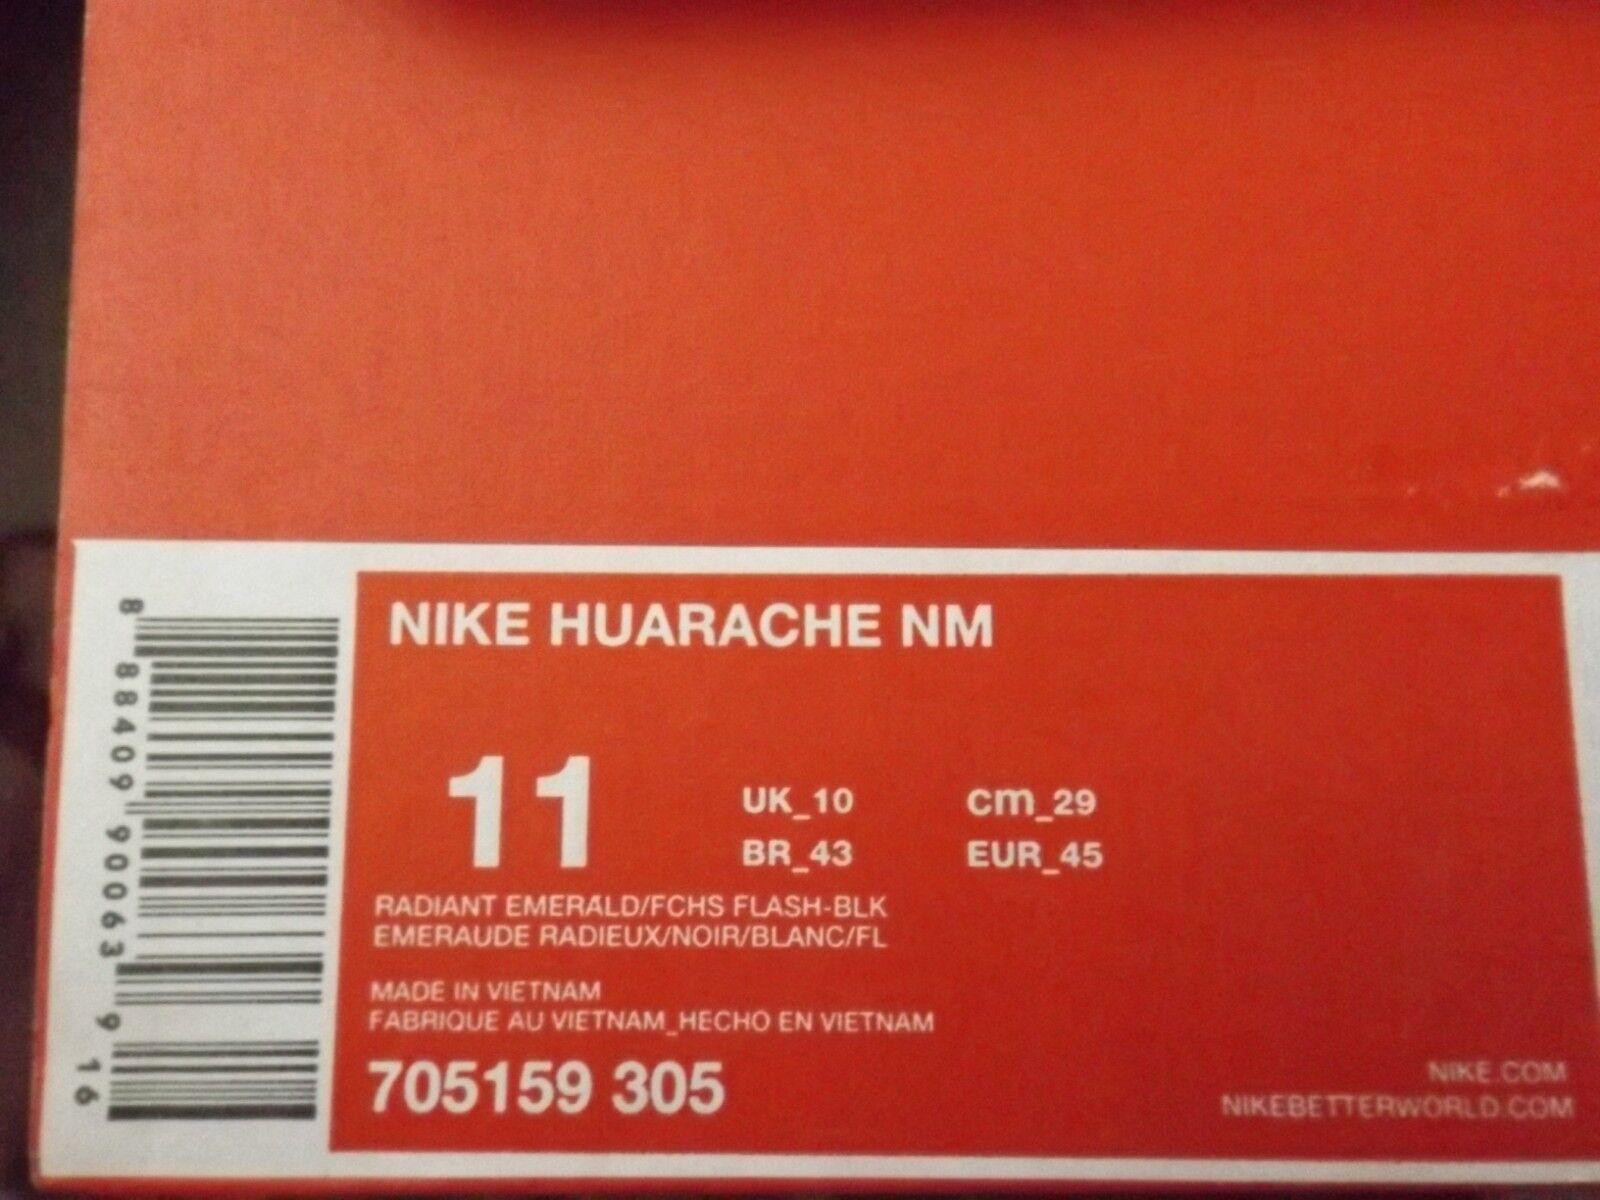 Nike smaragdgrünen huarache nm männer laufschuhe smaragdgrünen Nike lila fuschia 705159-305 70e10e